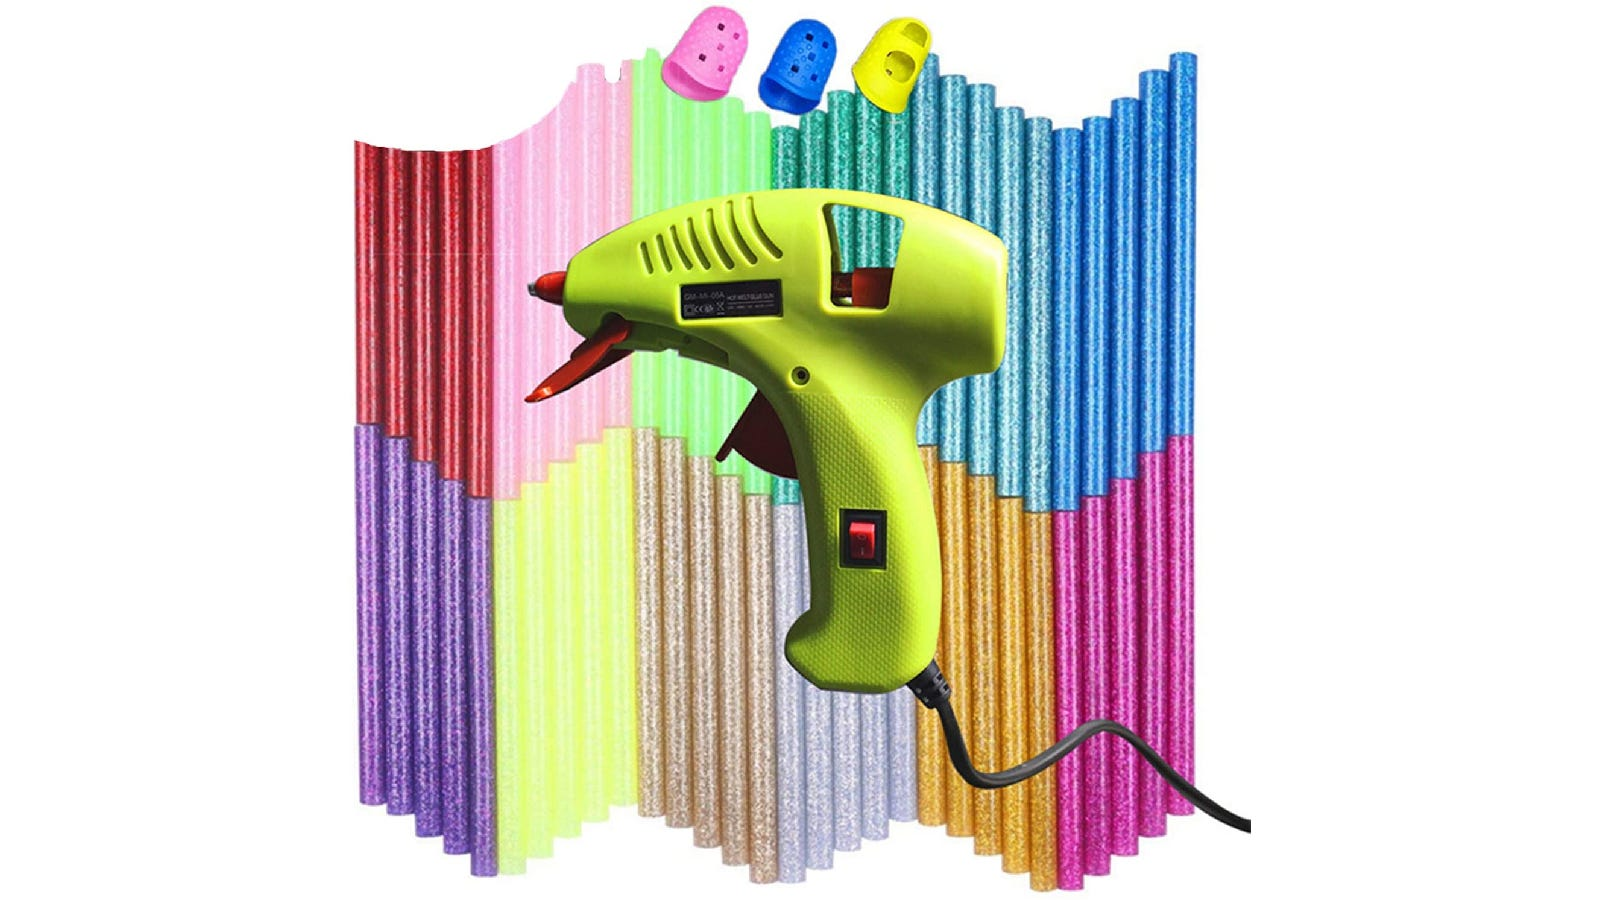 lime green glue gun on a background of colorful, glitter glue sticks